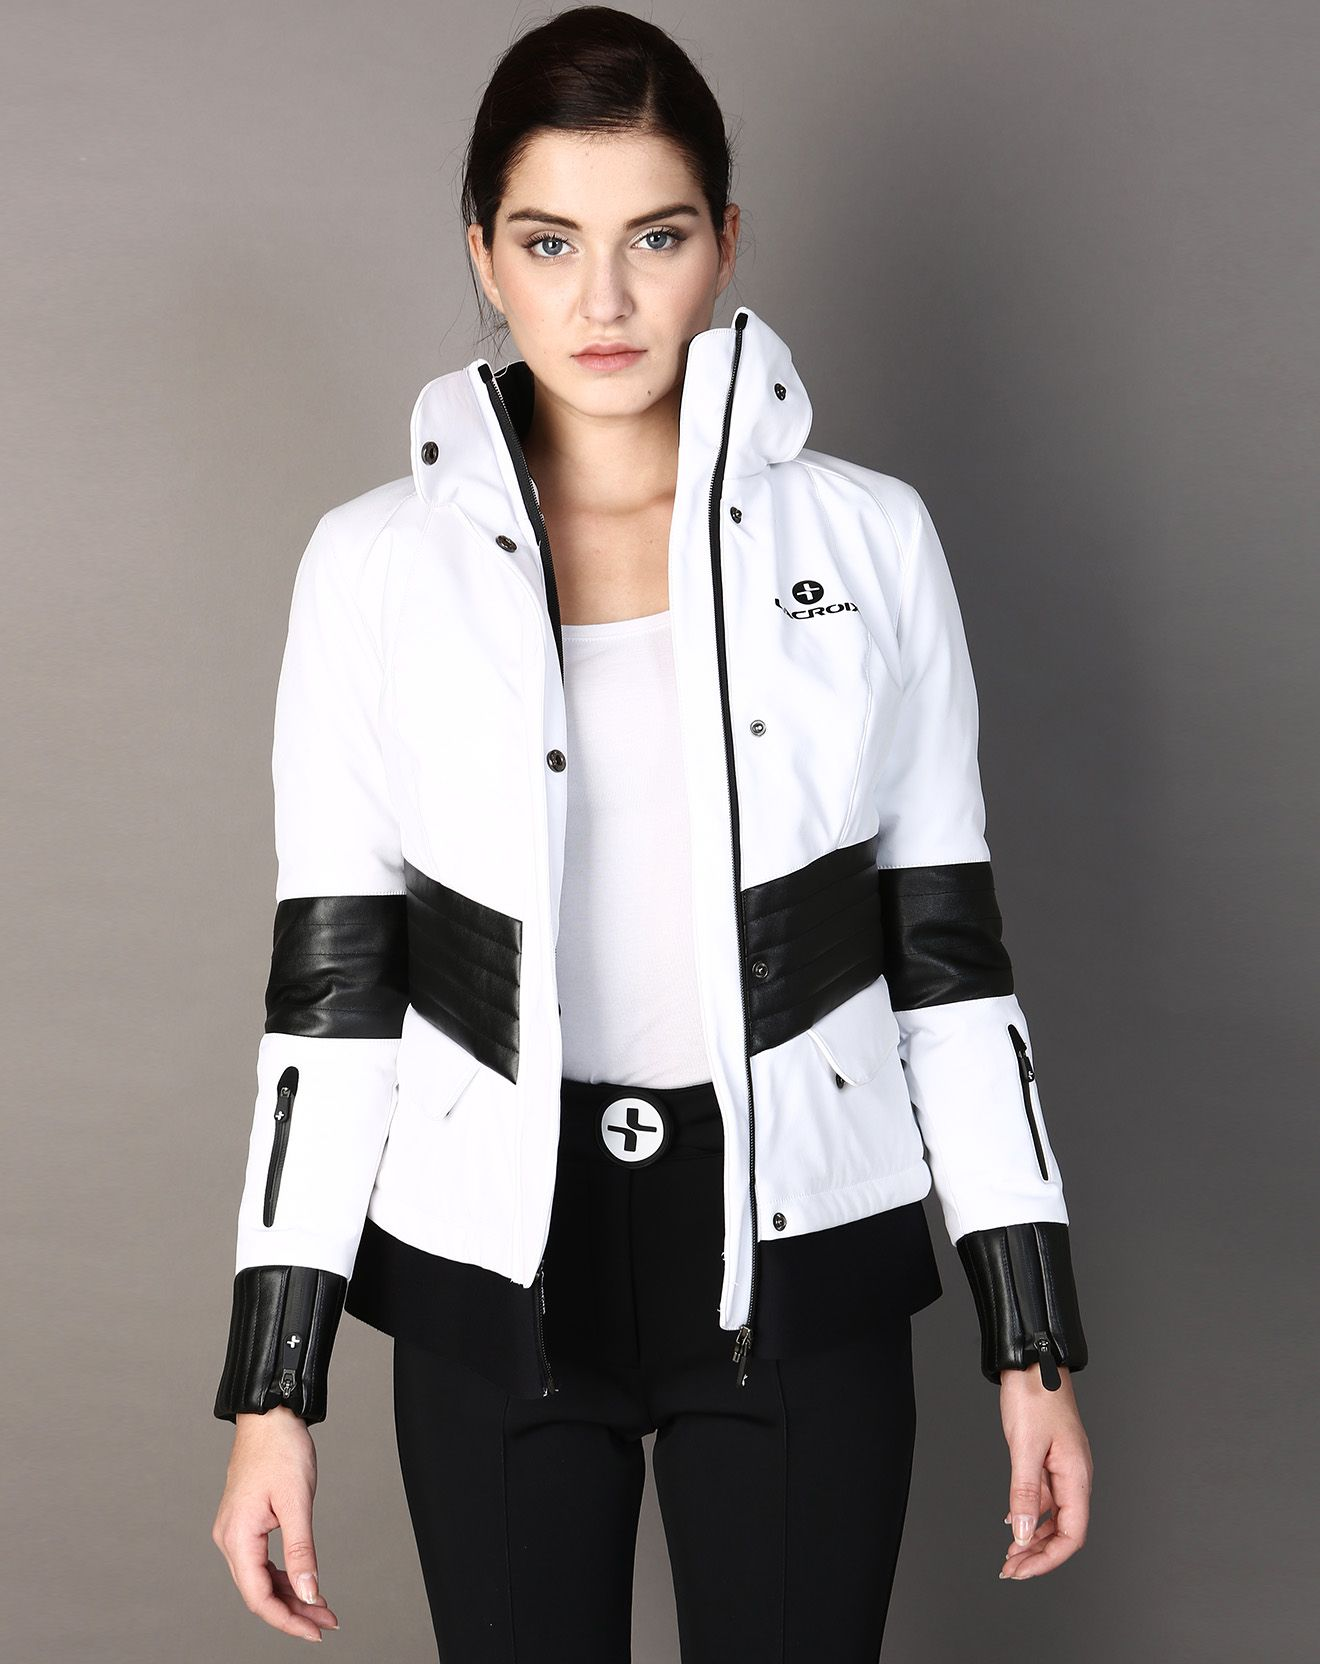 455€ - LACROIX Veste ski matskin aspen blanc et noir  12b485083